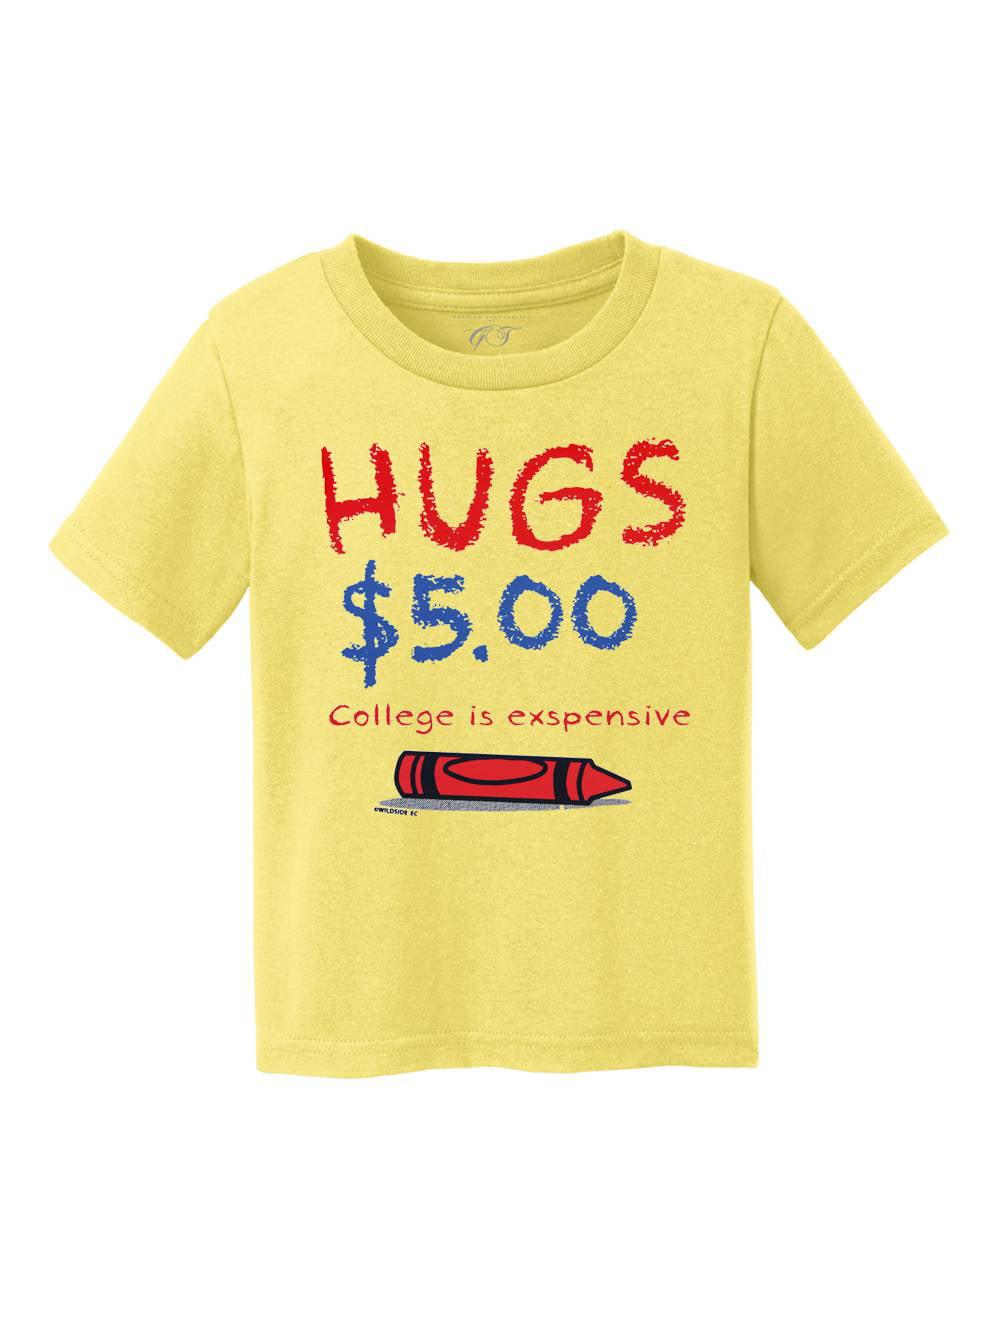 Toddlers Hugs $5.00 Short-Sleeve T-Shirt